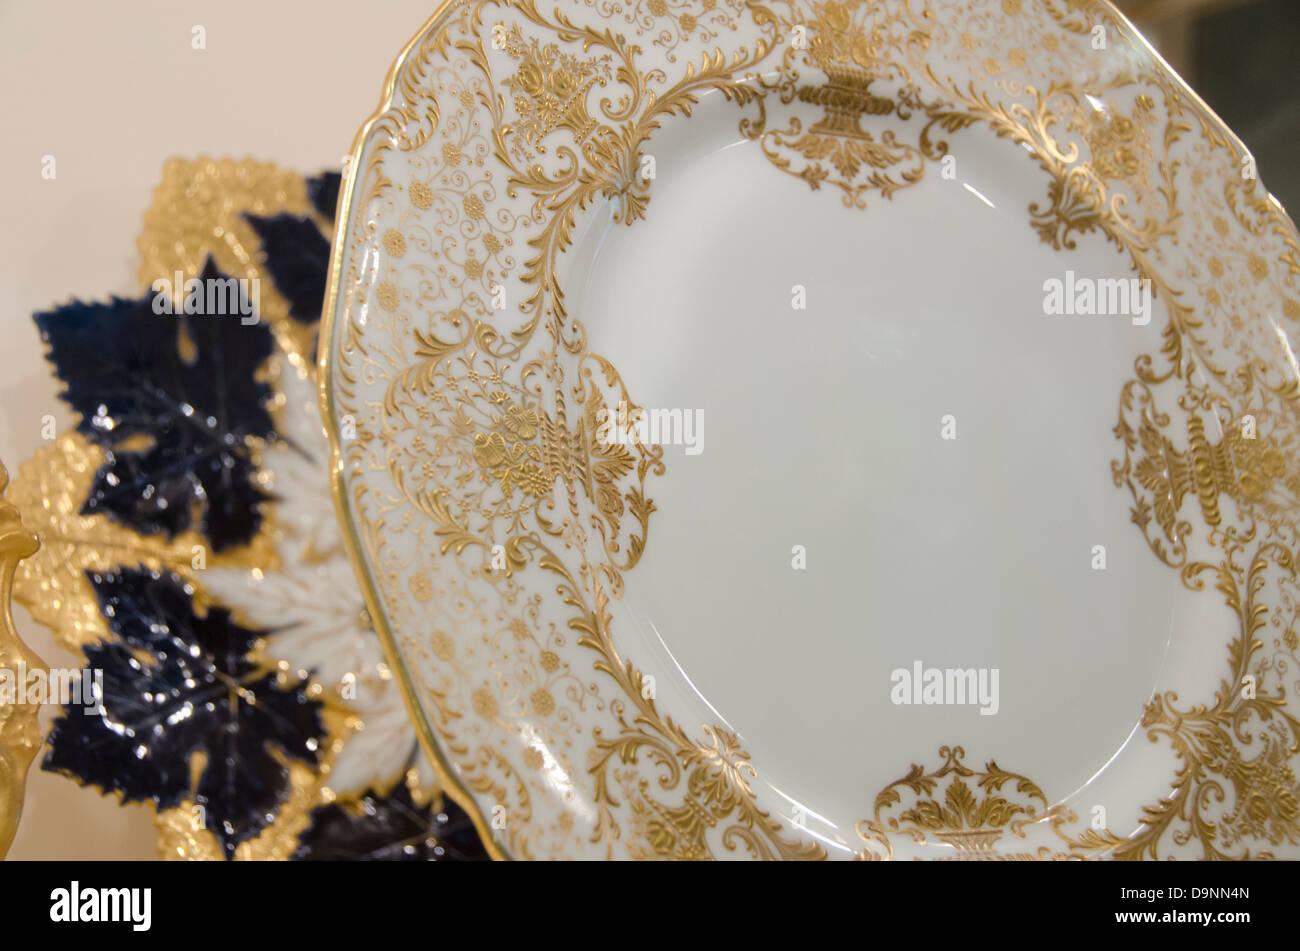 China Plate Stockfotos & China Plate Bilder - Alamy